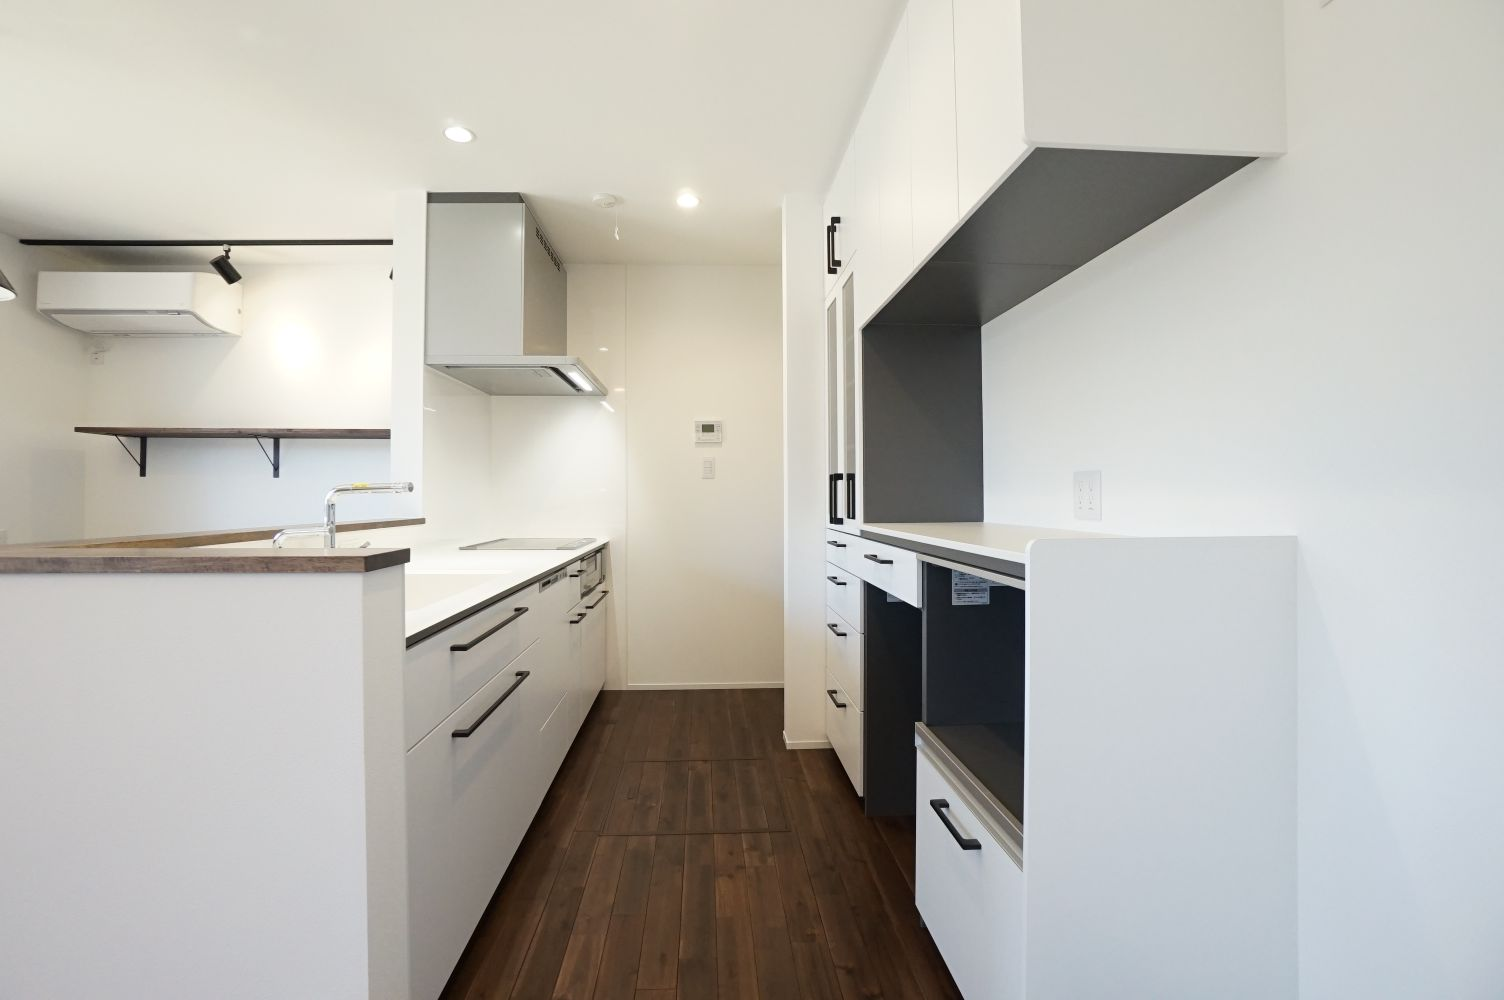 RIKYU (リキュー)【間取り、建築家、インテリア】清潔感のある白で統一したキッチン。作業スペースが広く、収納も充実。起きさまから目の届く位置にスタディカウンターを造作し、子どもたちを見守る